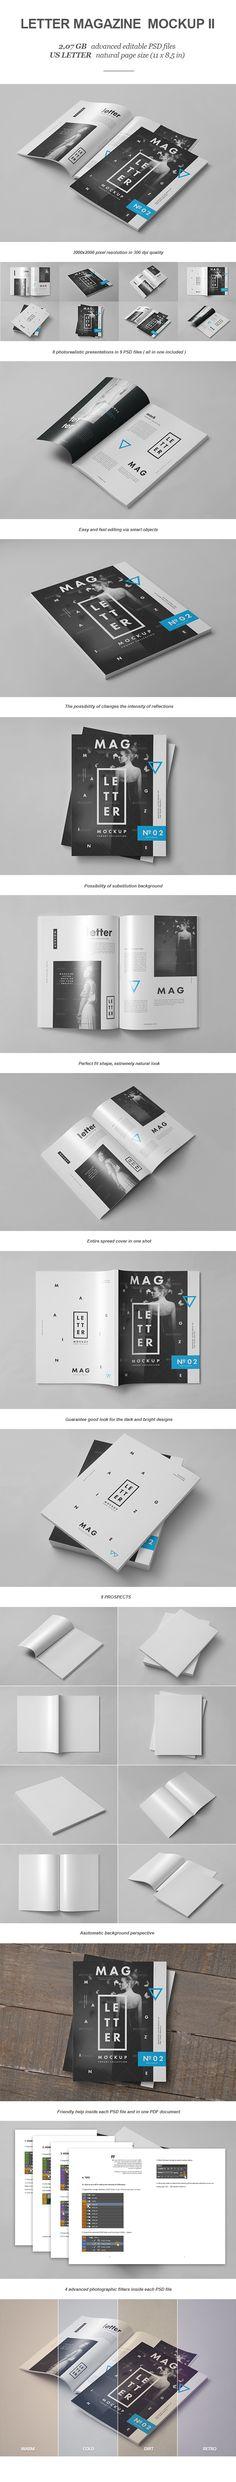 Letter Magazine / Brochure Mock-up II by yogurt86, via Behance